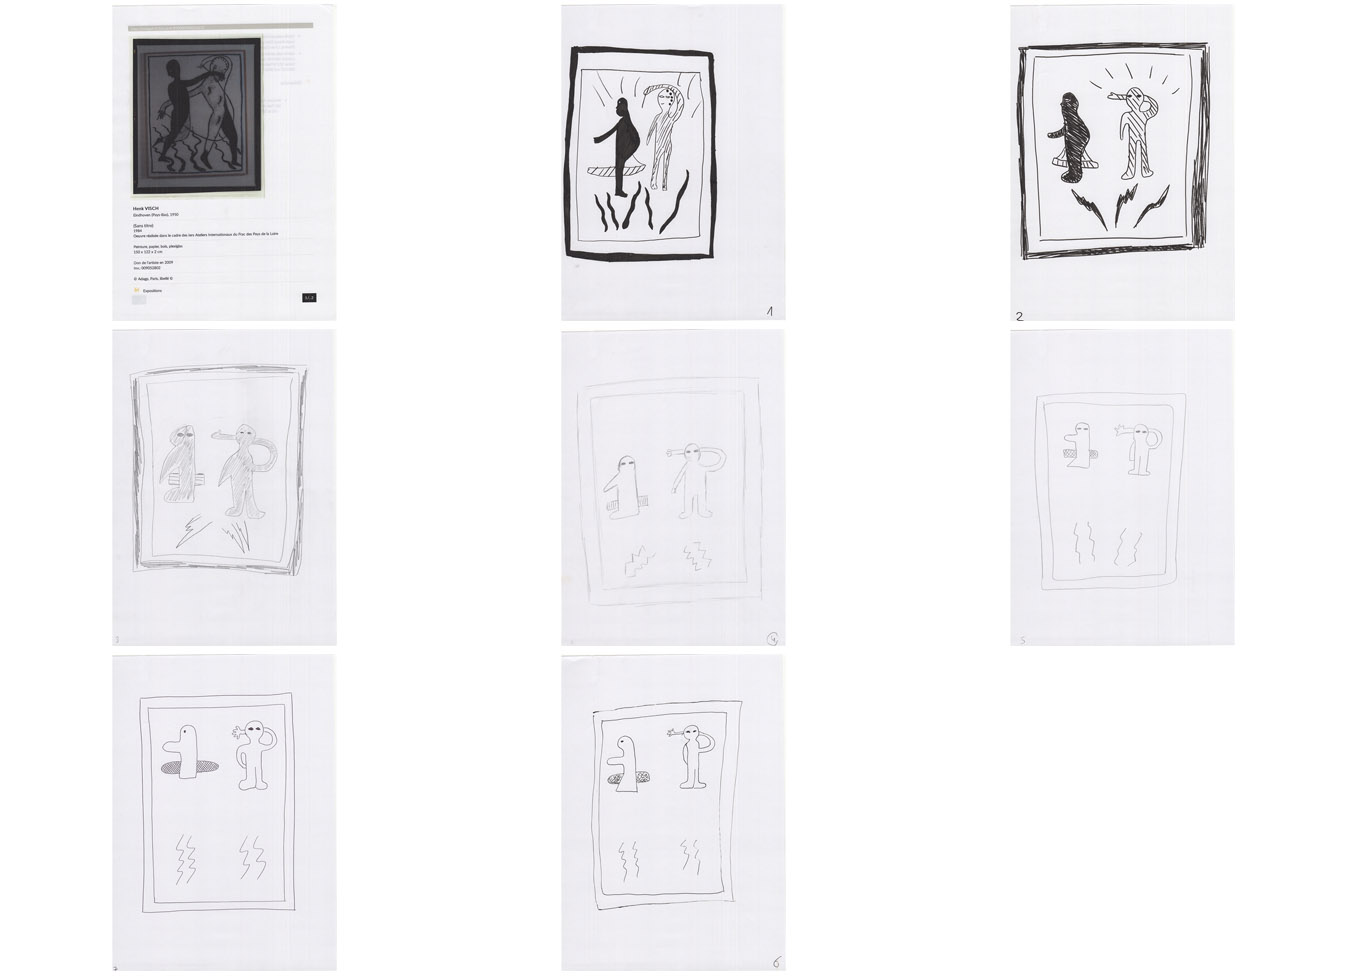 Series from Henk Visch - Sans Titre, 1984